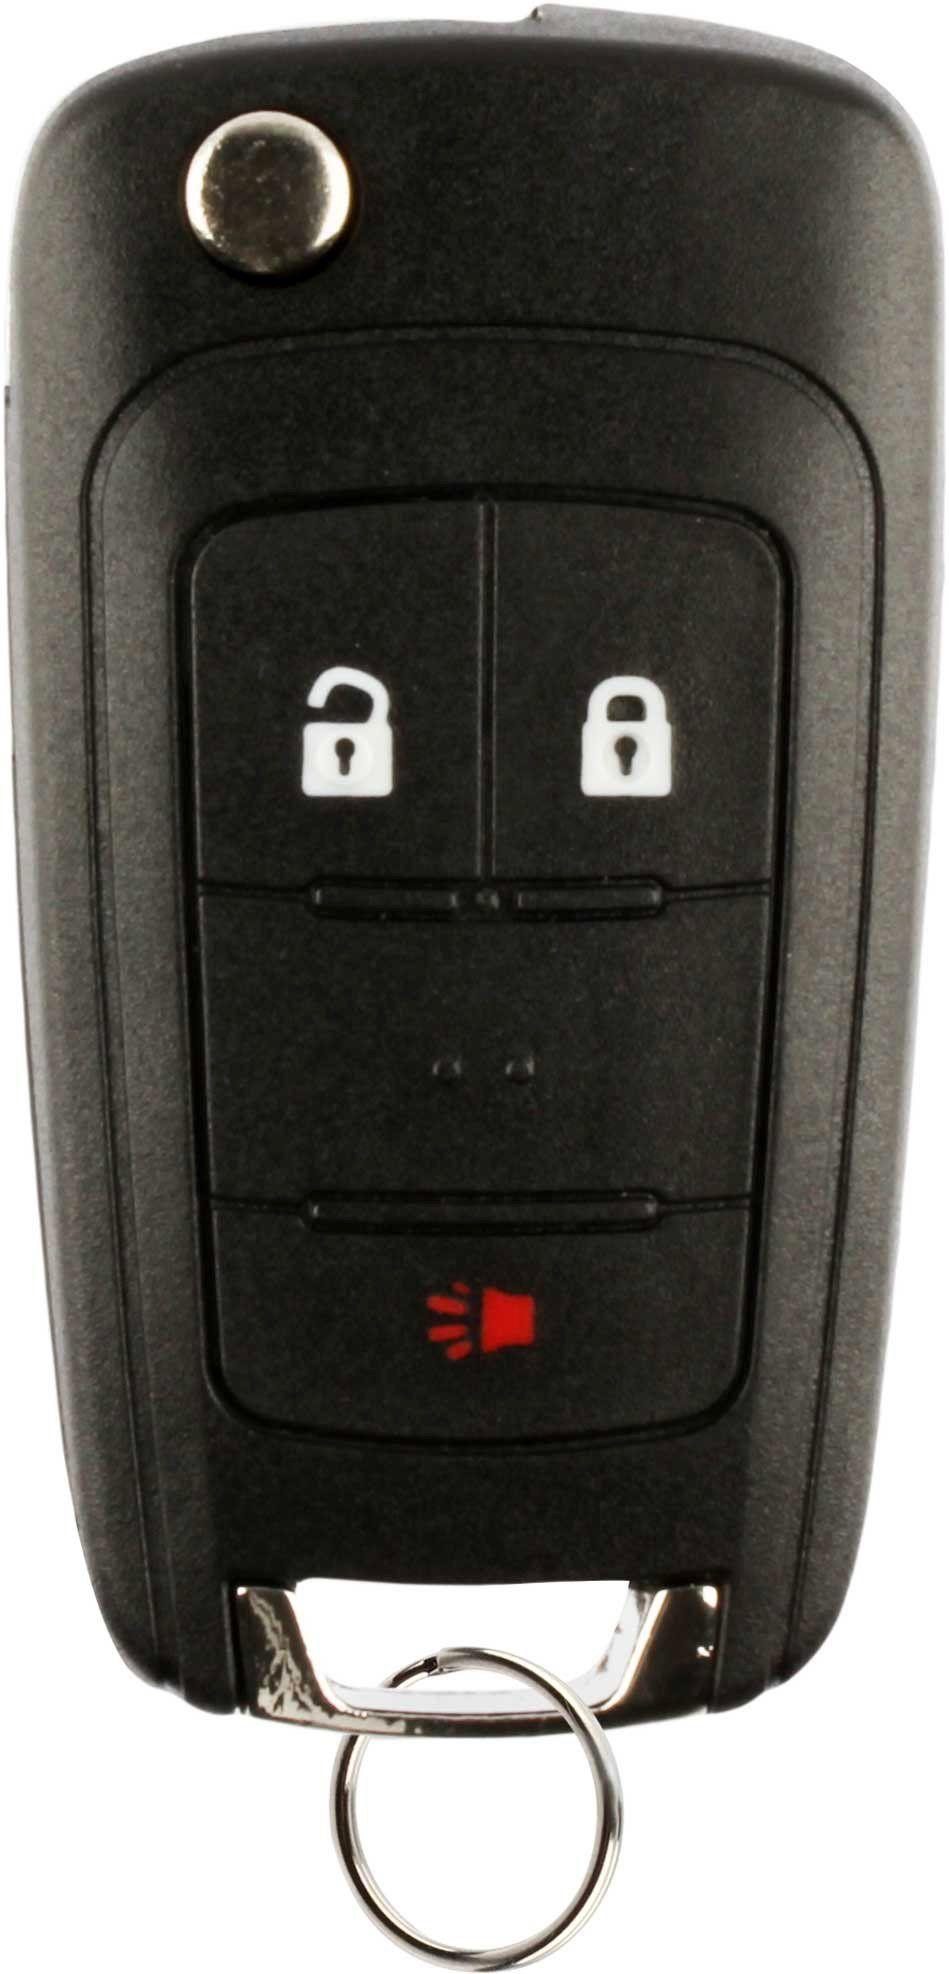 Discount keyless keyless entry remote uncut car key fob